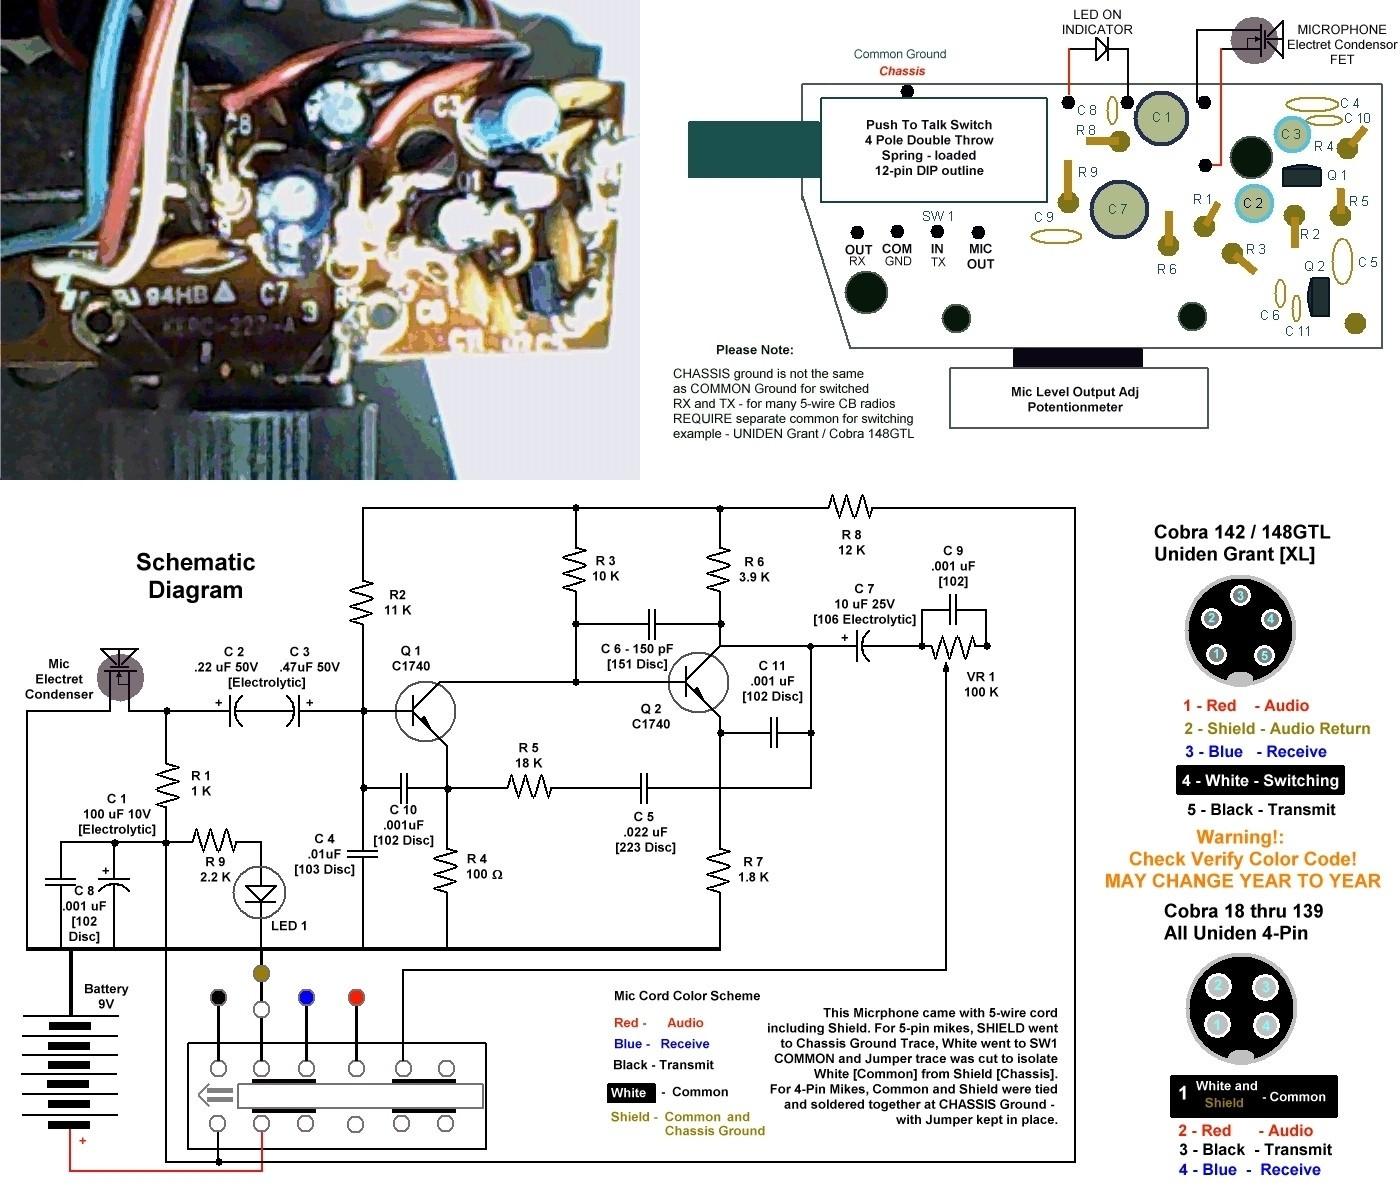 cb radio mic wiring diagrams furthermore pin cb mic wiring diagram rh lemise co Midland CB Mic Wiring Diagram uniden cb microphone wiring diagram